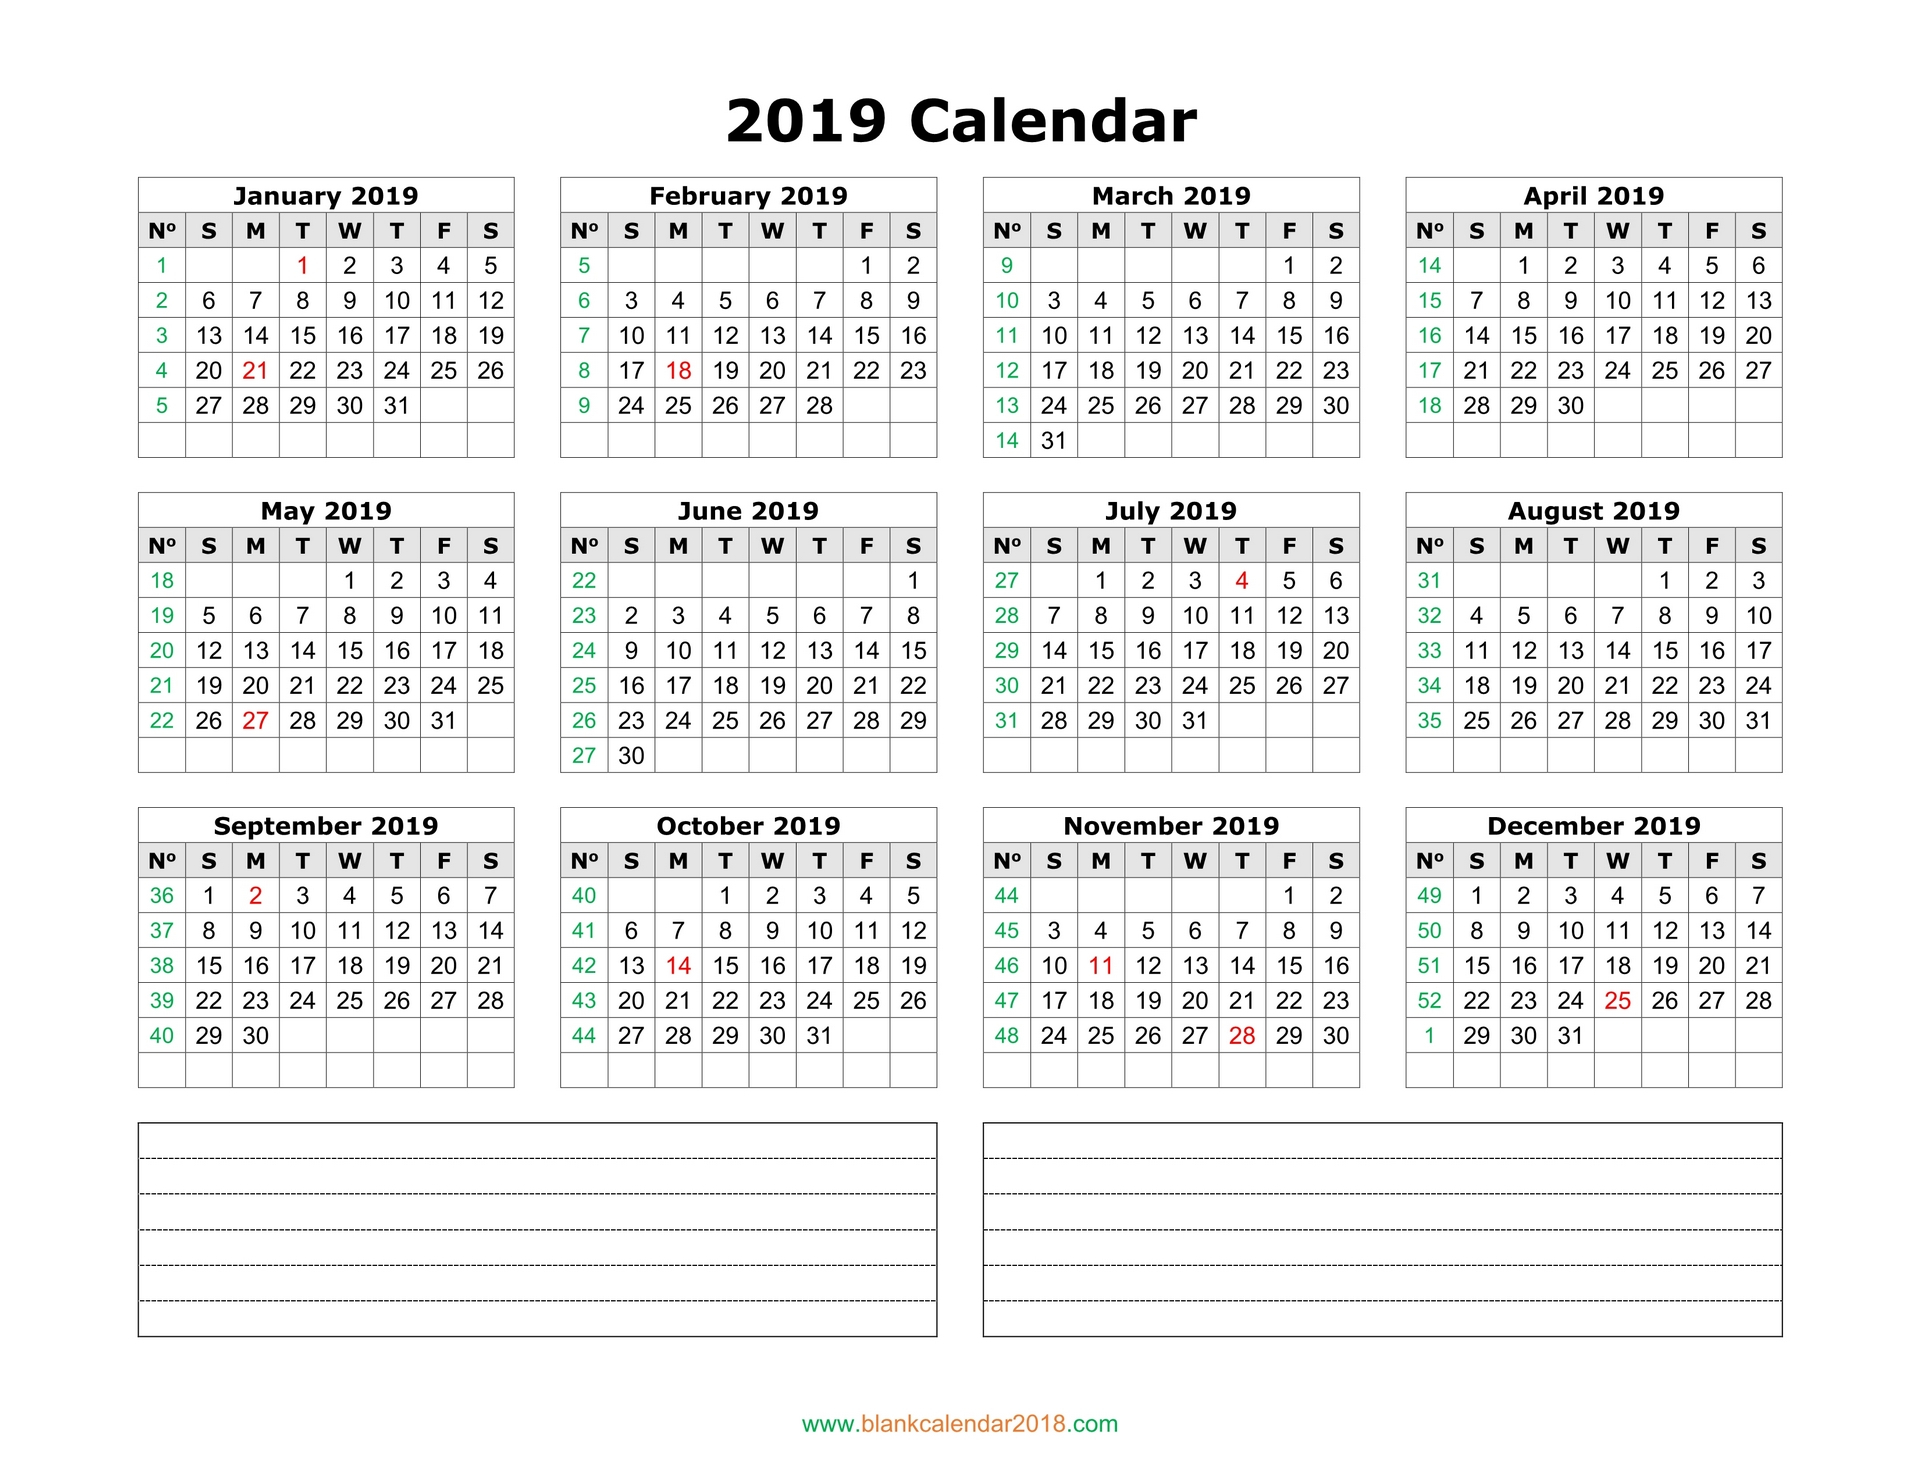 Blank Calendar 2019 Intended For 52 Week Printable Calendar Blank